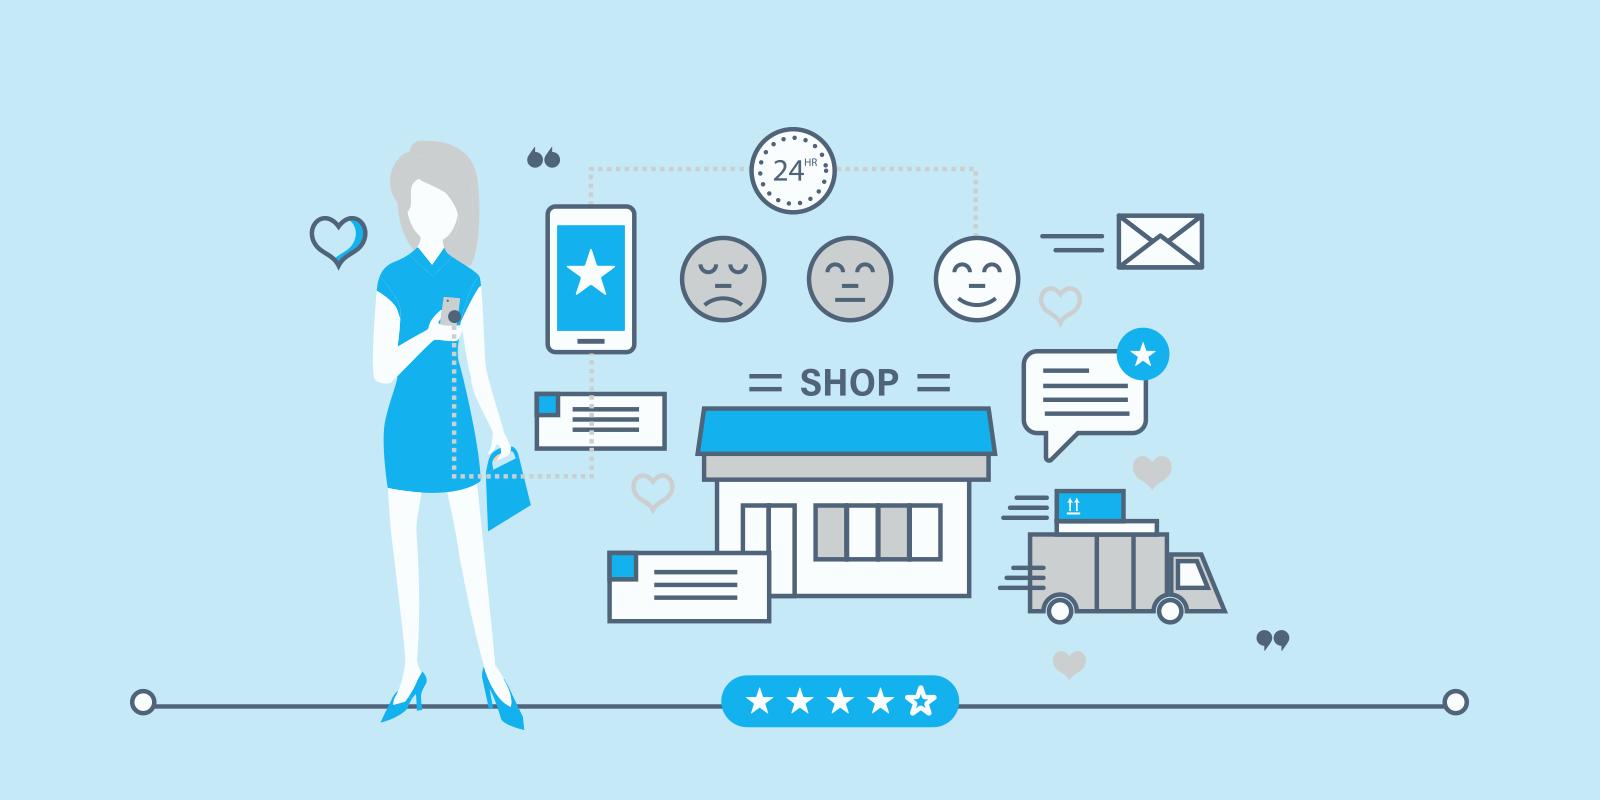 Voice of Customer metrics